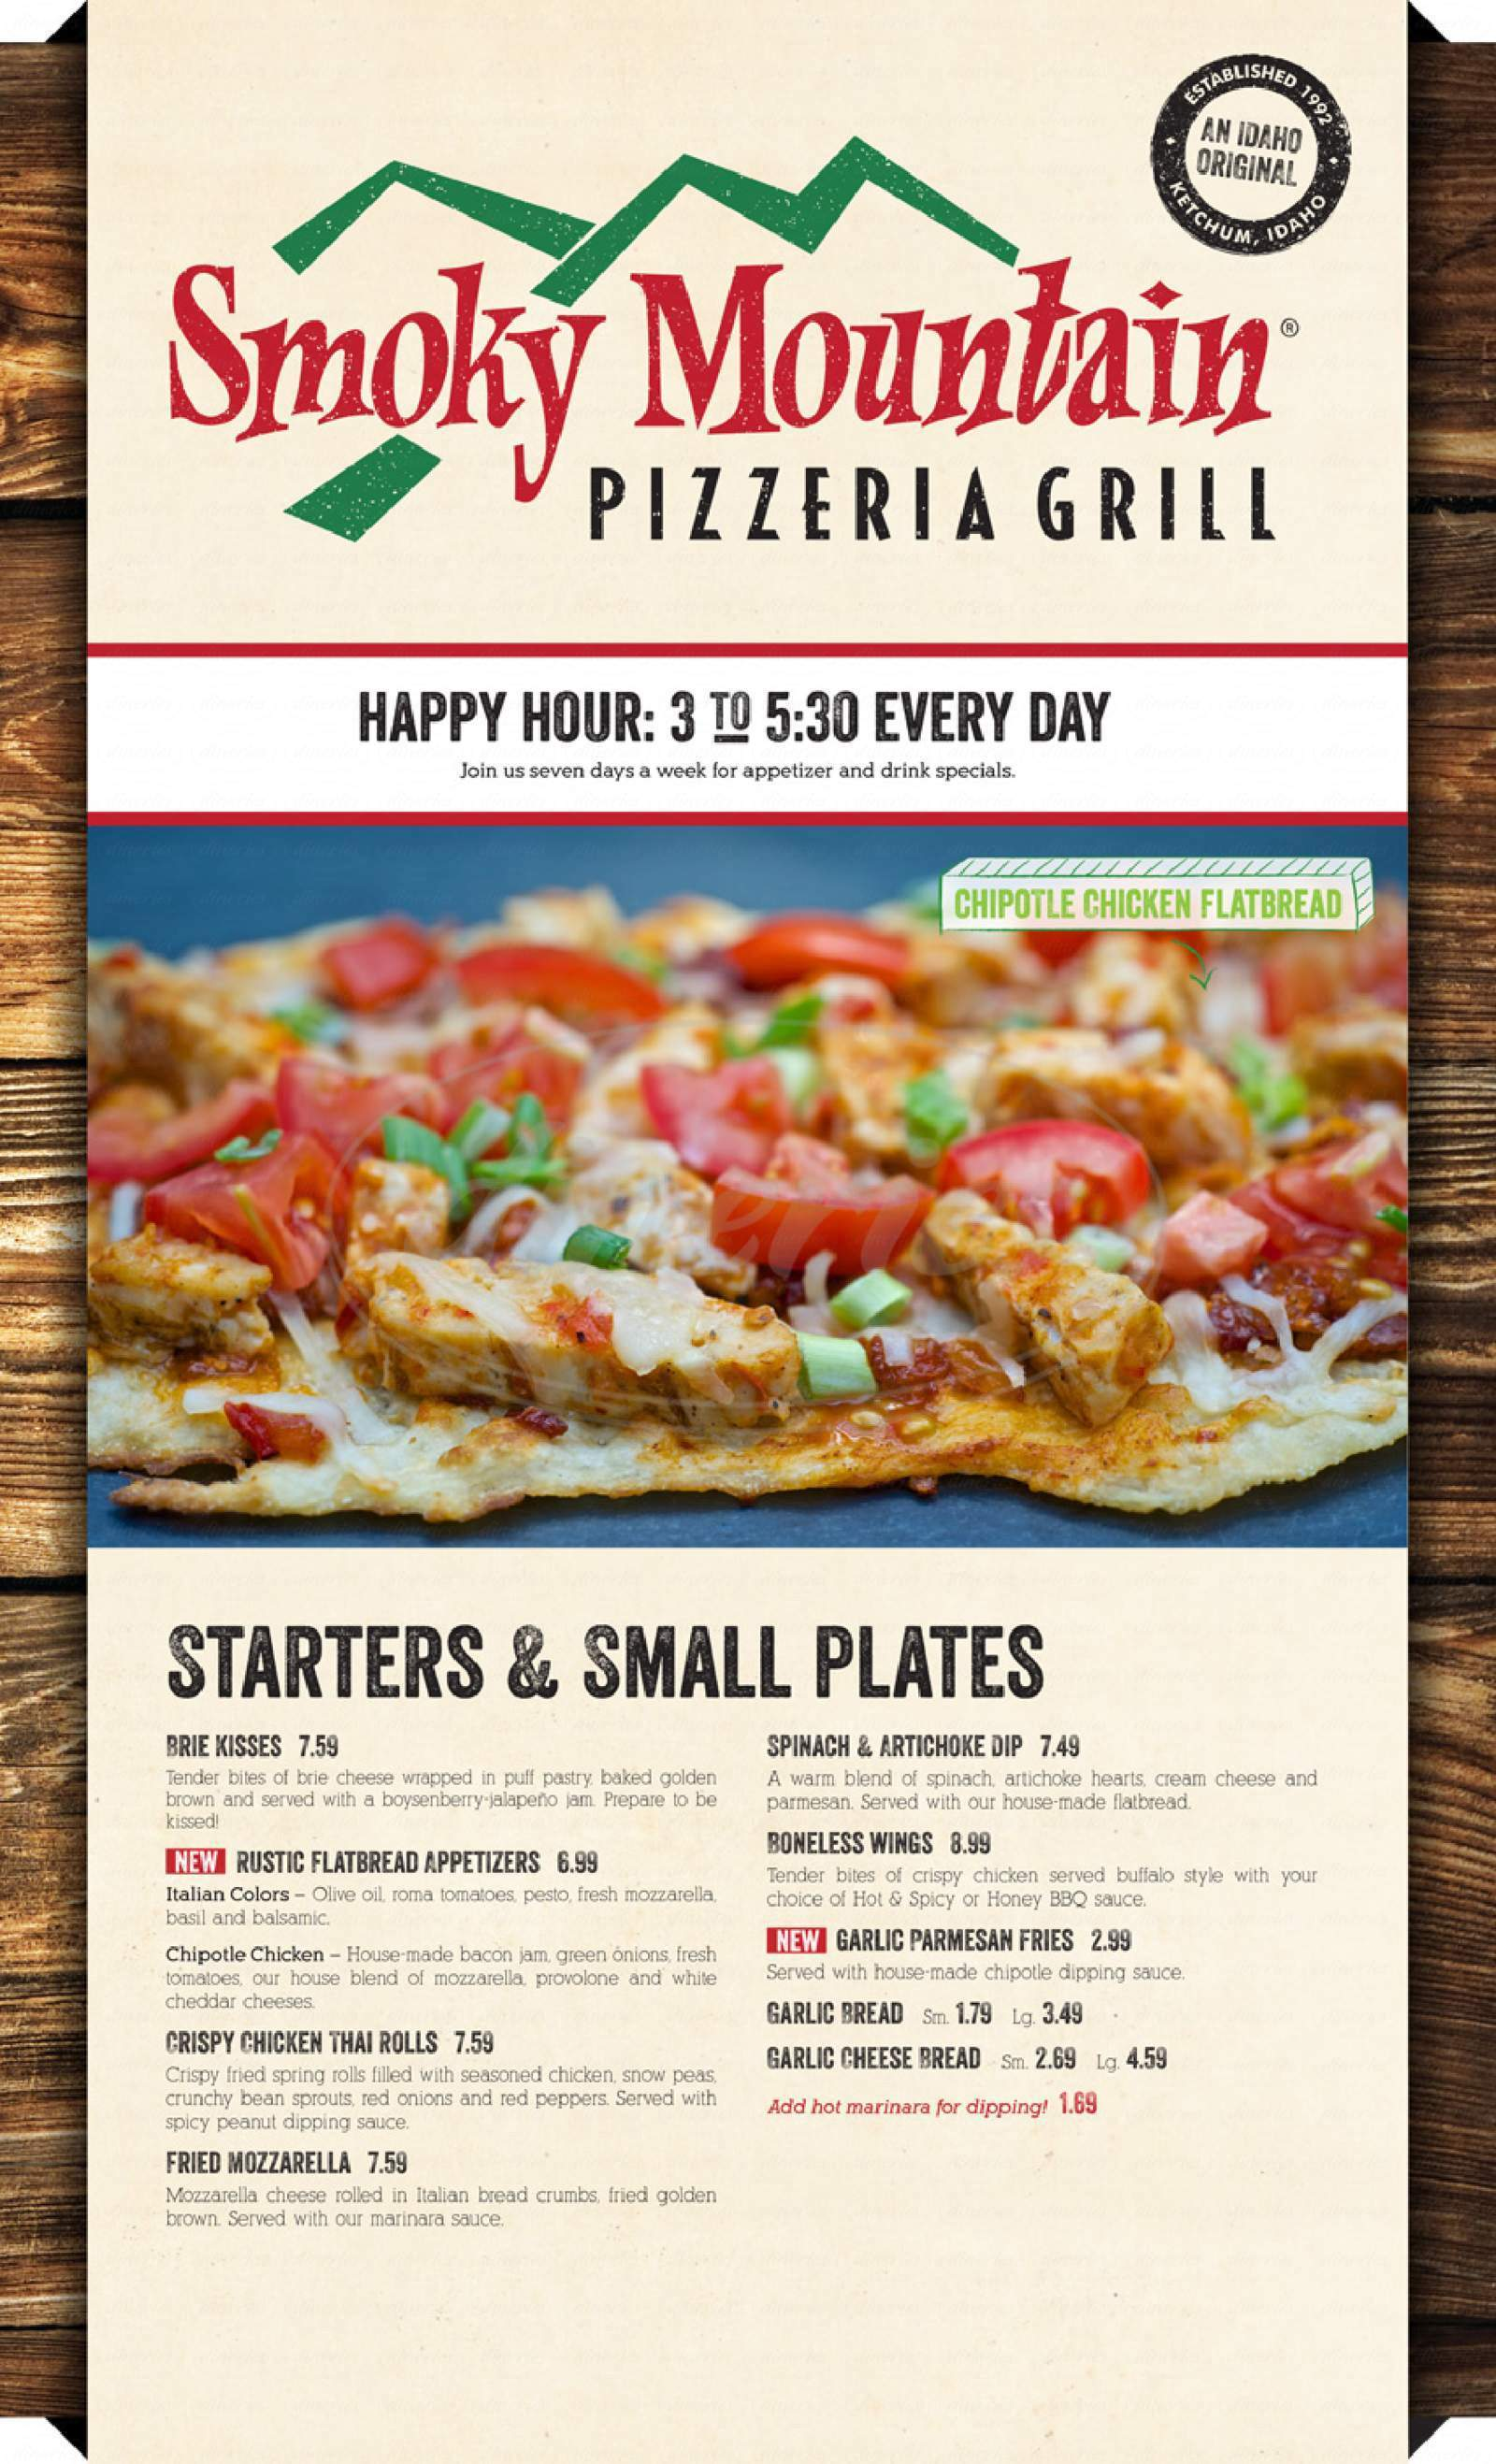 menu for Smoky Mountain Pizzeria Grill